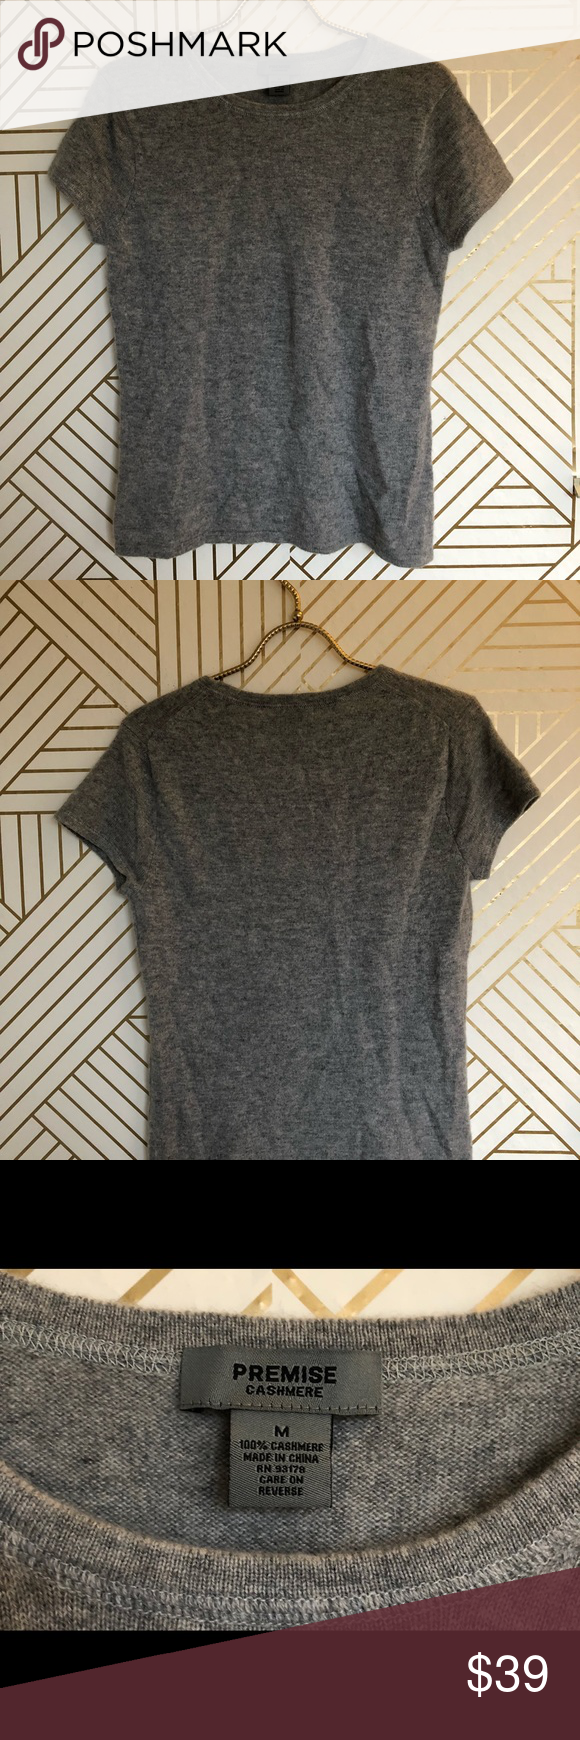 Premise cashmere short sleeve sweater | Short sleeved